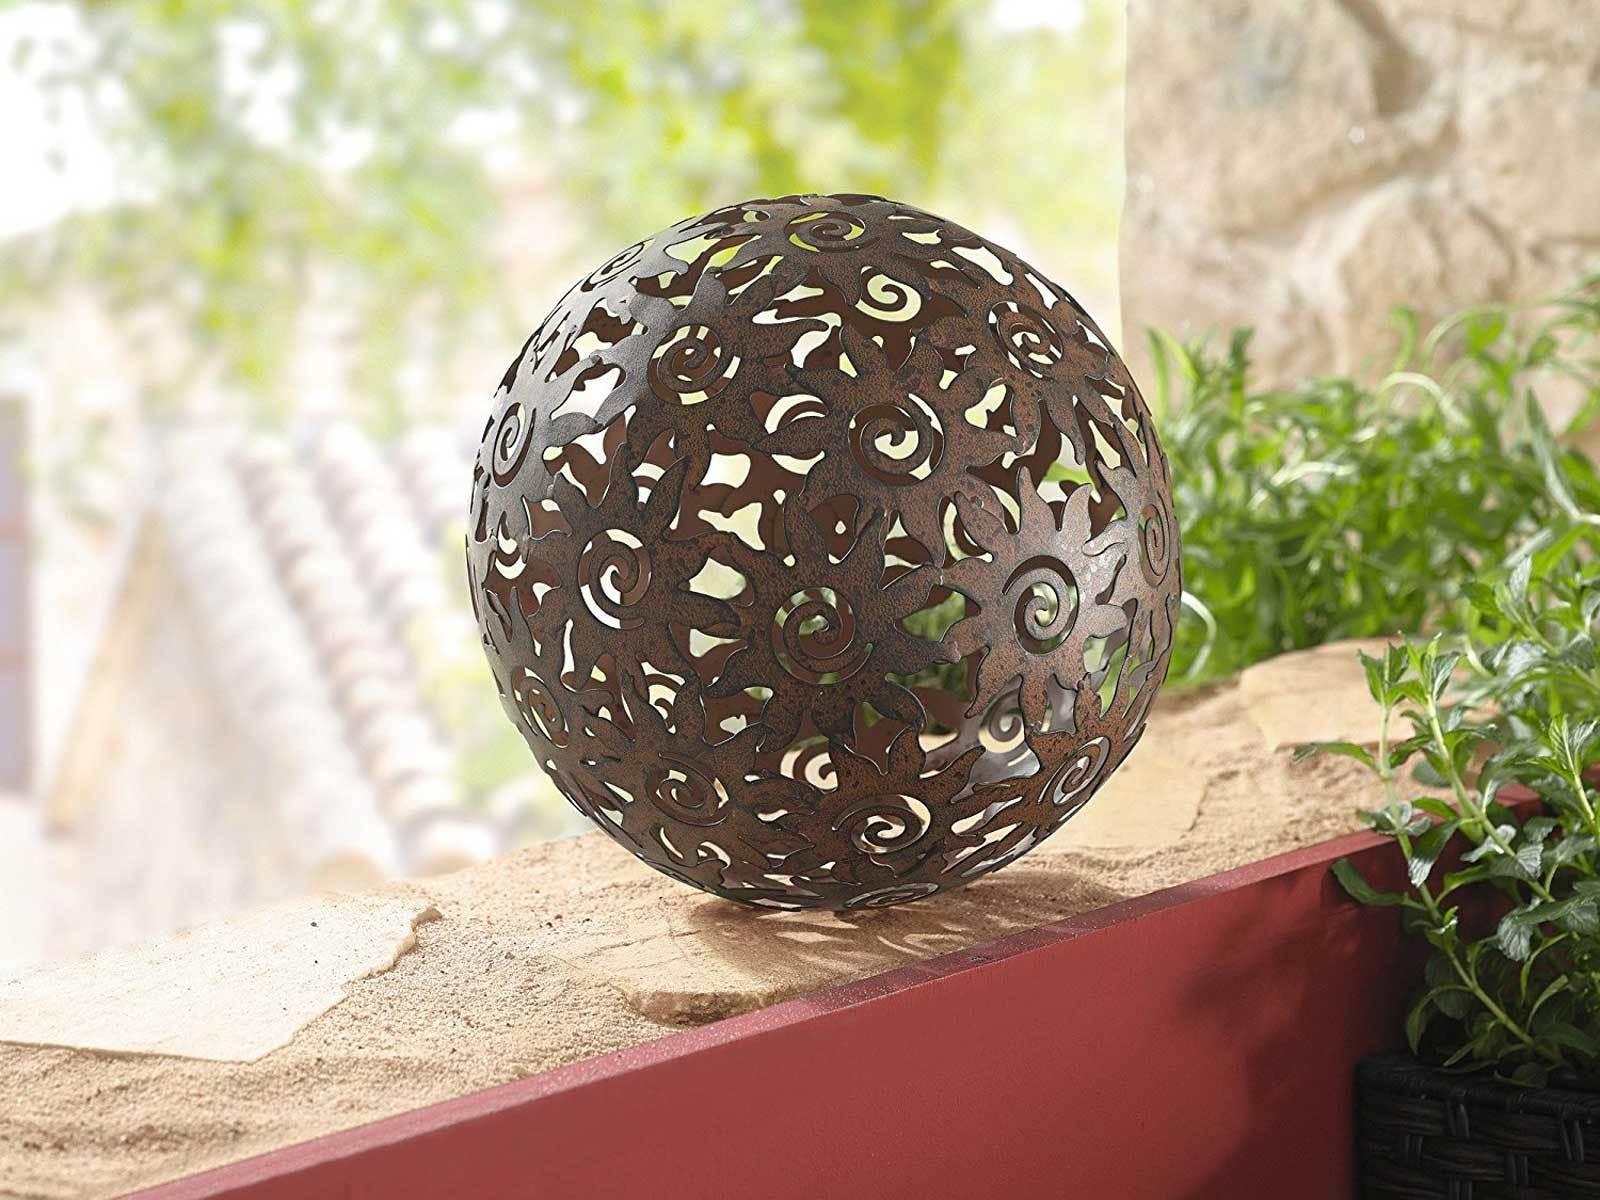 Dekokugel Blumen Metallkugel Rost Gartendeko Gartenkugel Terrasse Deko Edelrost